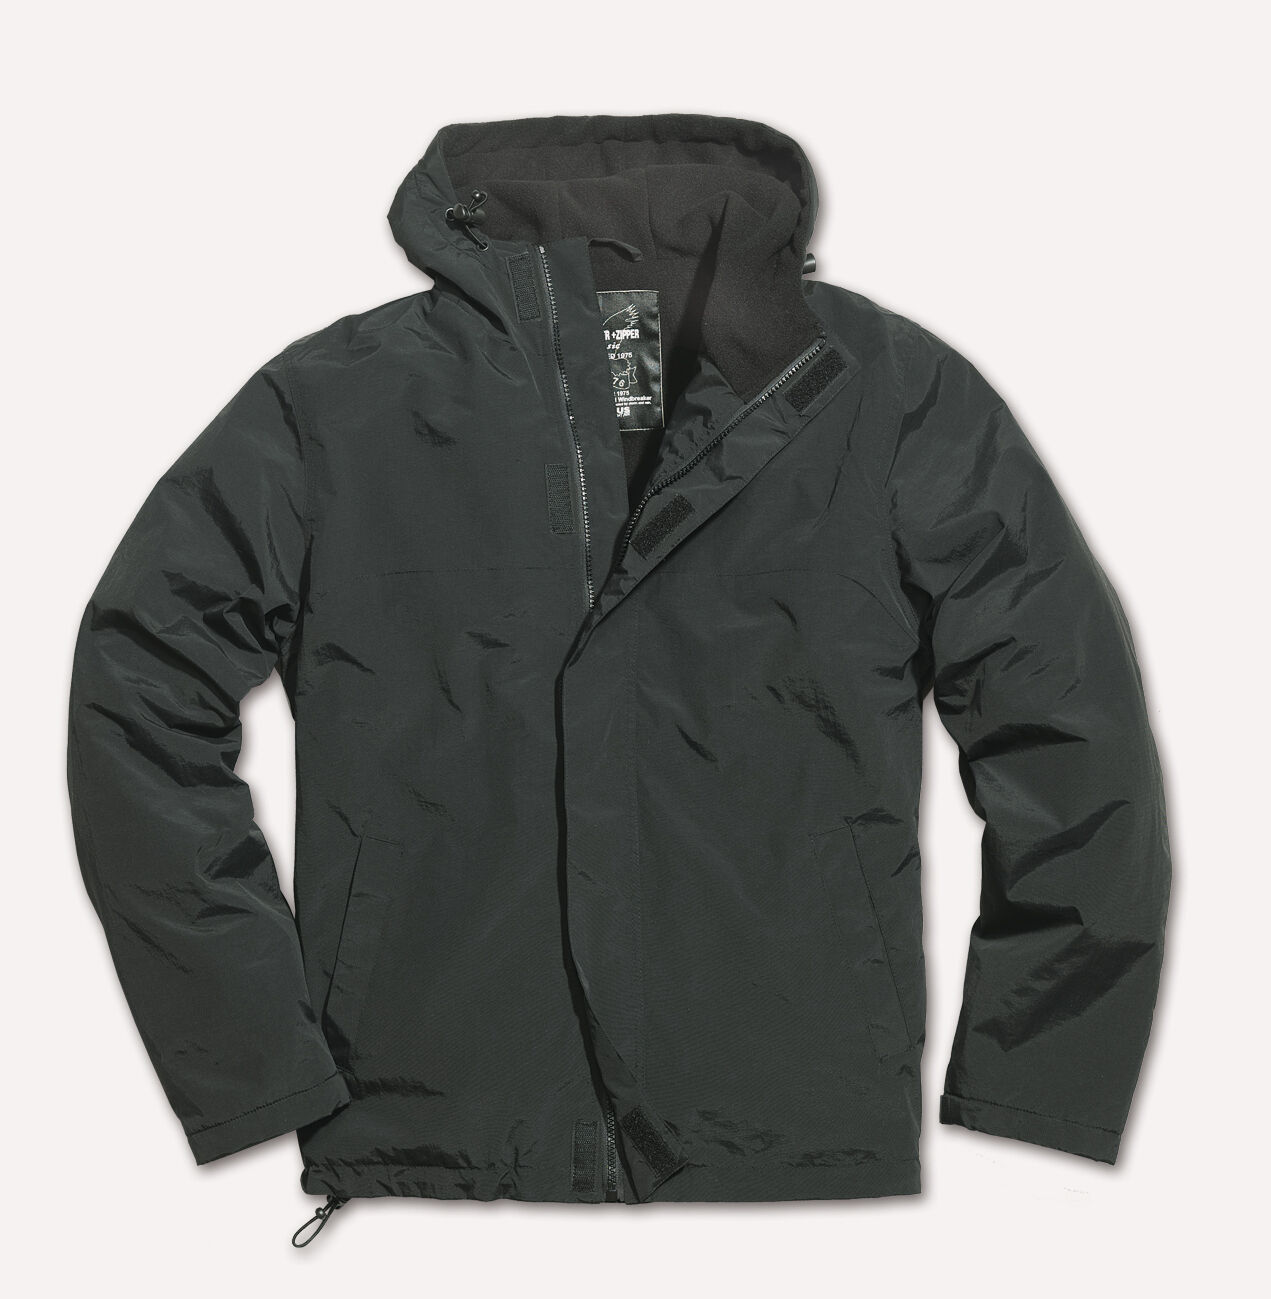 Surplus Windbreaker Zipper 20-7002 Herren Regenjacke Jacke Kapuze Reißverschluß